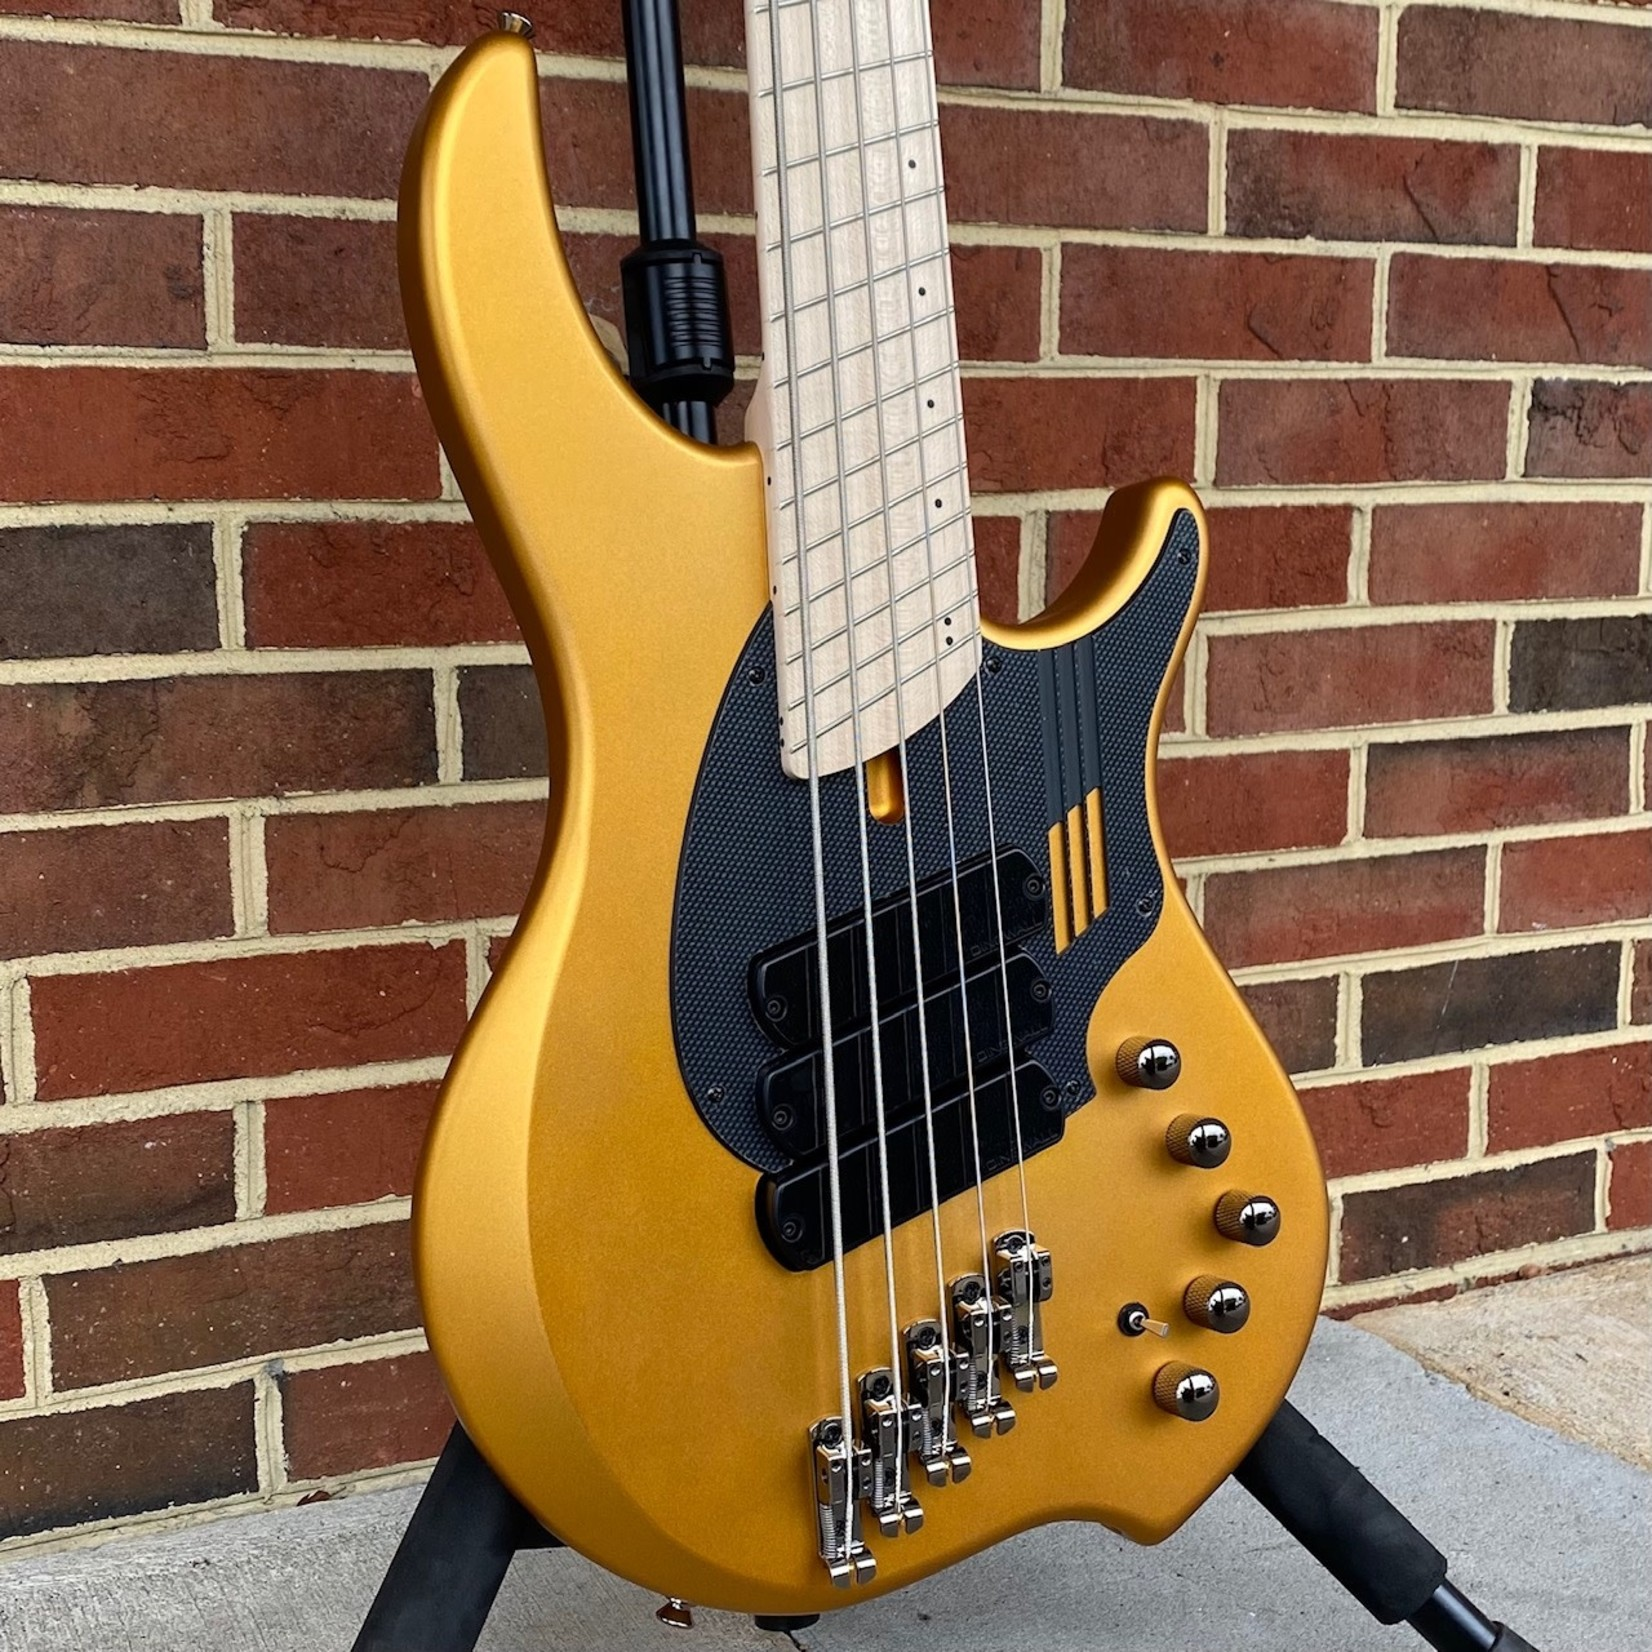 Dingwall Dingwall NG3 5-String, Matte Gold Metallic, Maple Fretboard, Matching Headstock, Dingwall Gig Bag, SN# 9520